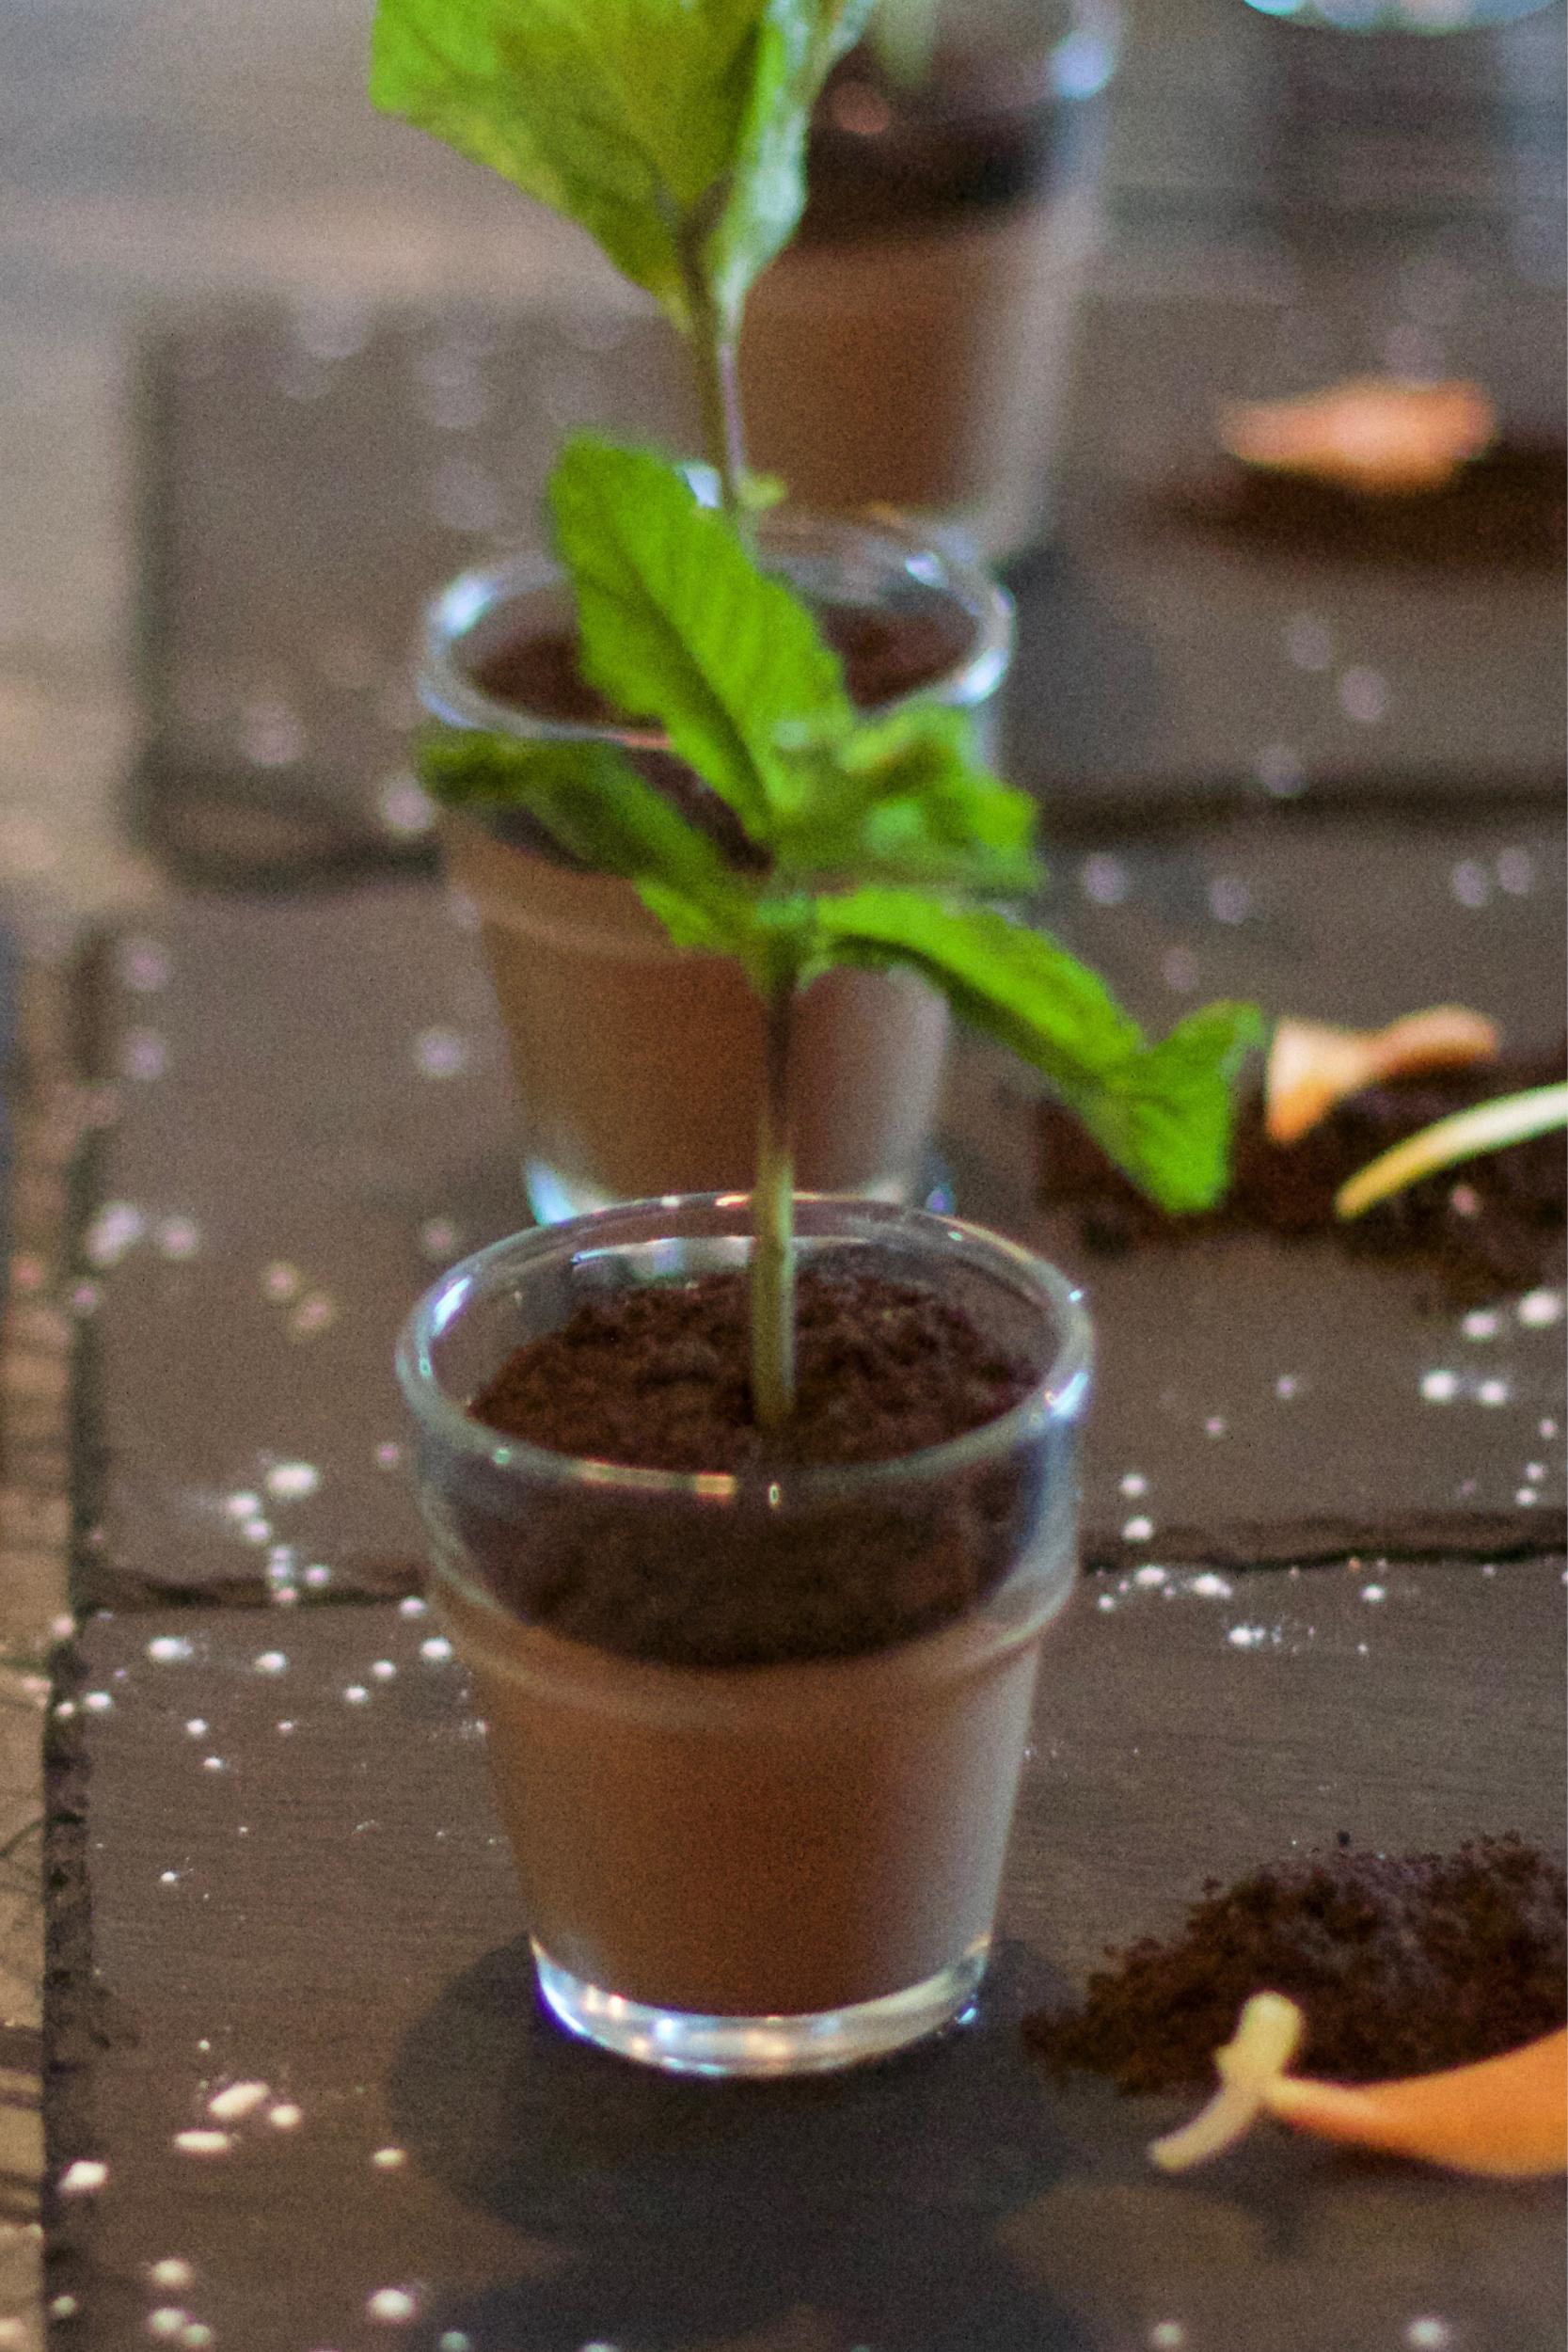 Potted-Plant-Dessert-4.jpg